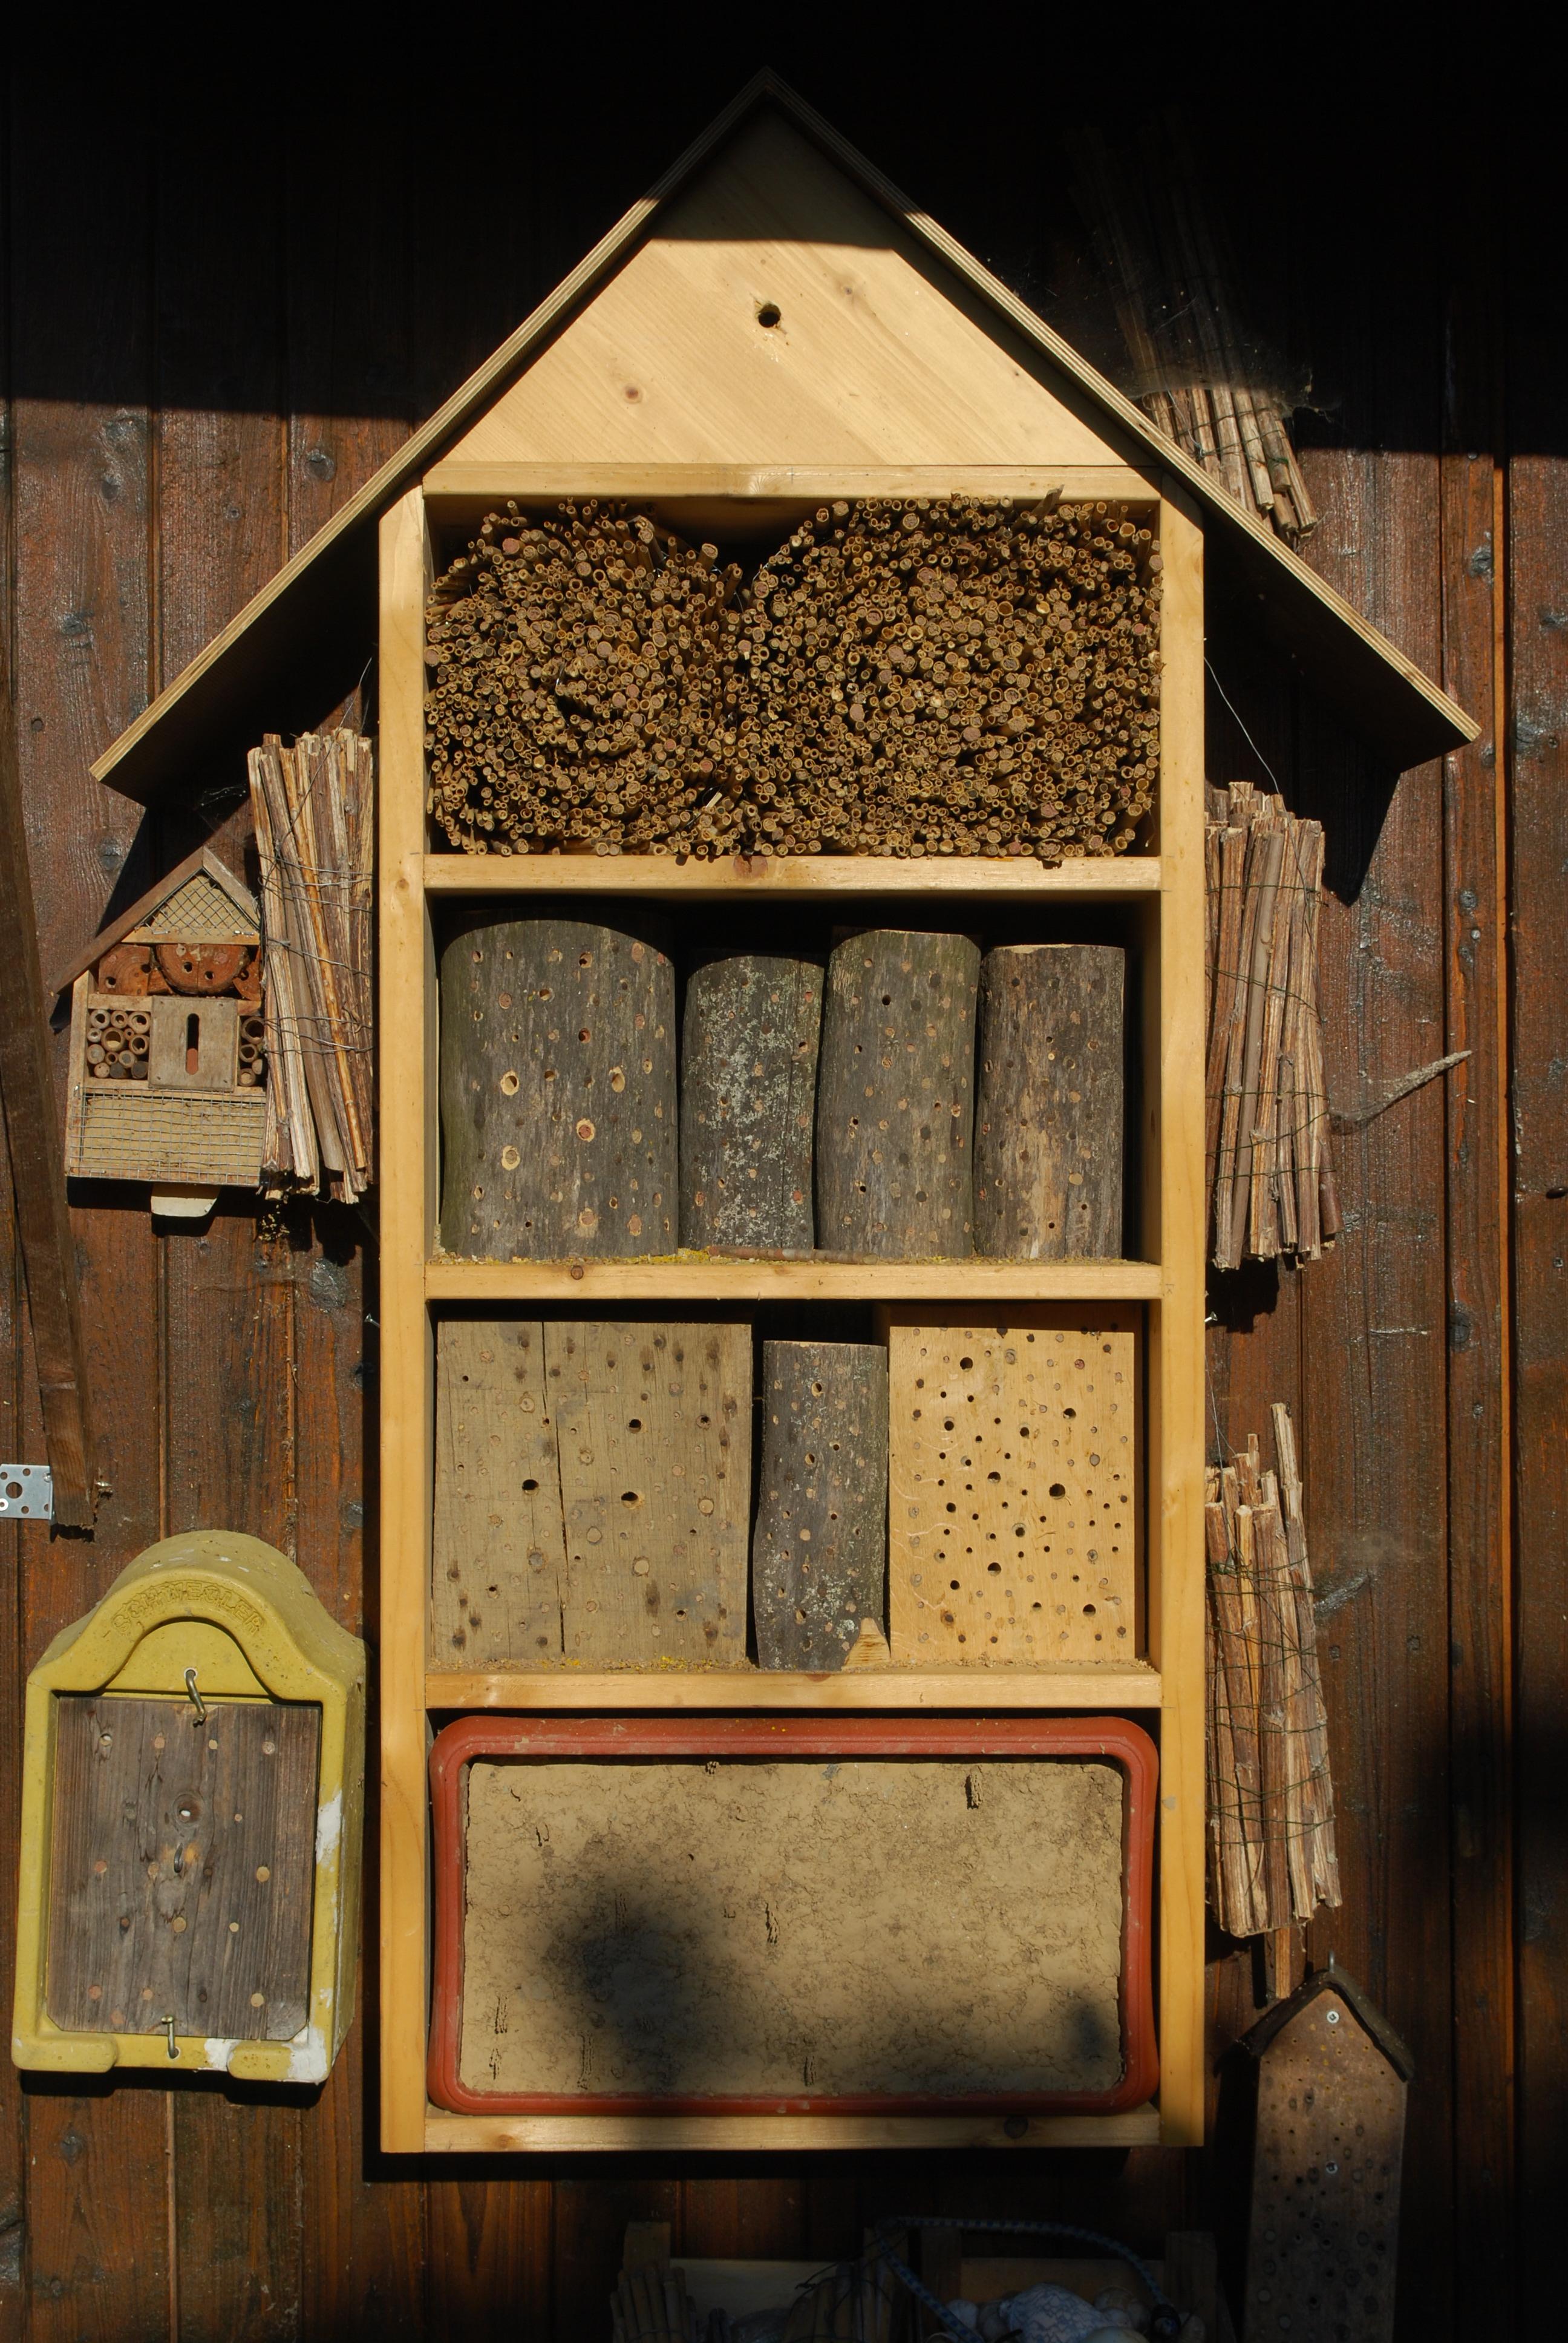 Wildbienen-Nisthilfe (Bild: H.-J. Flügel)